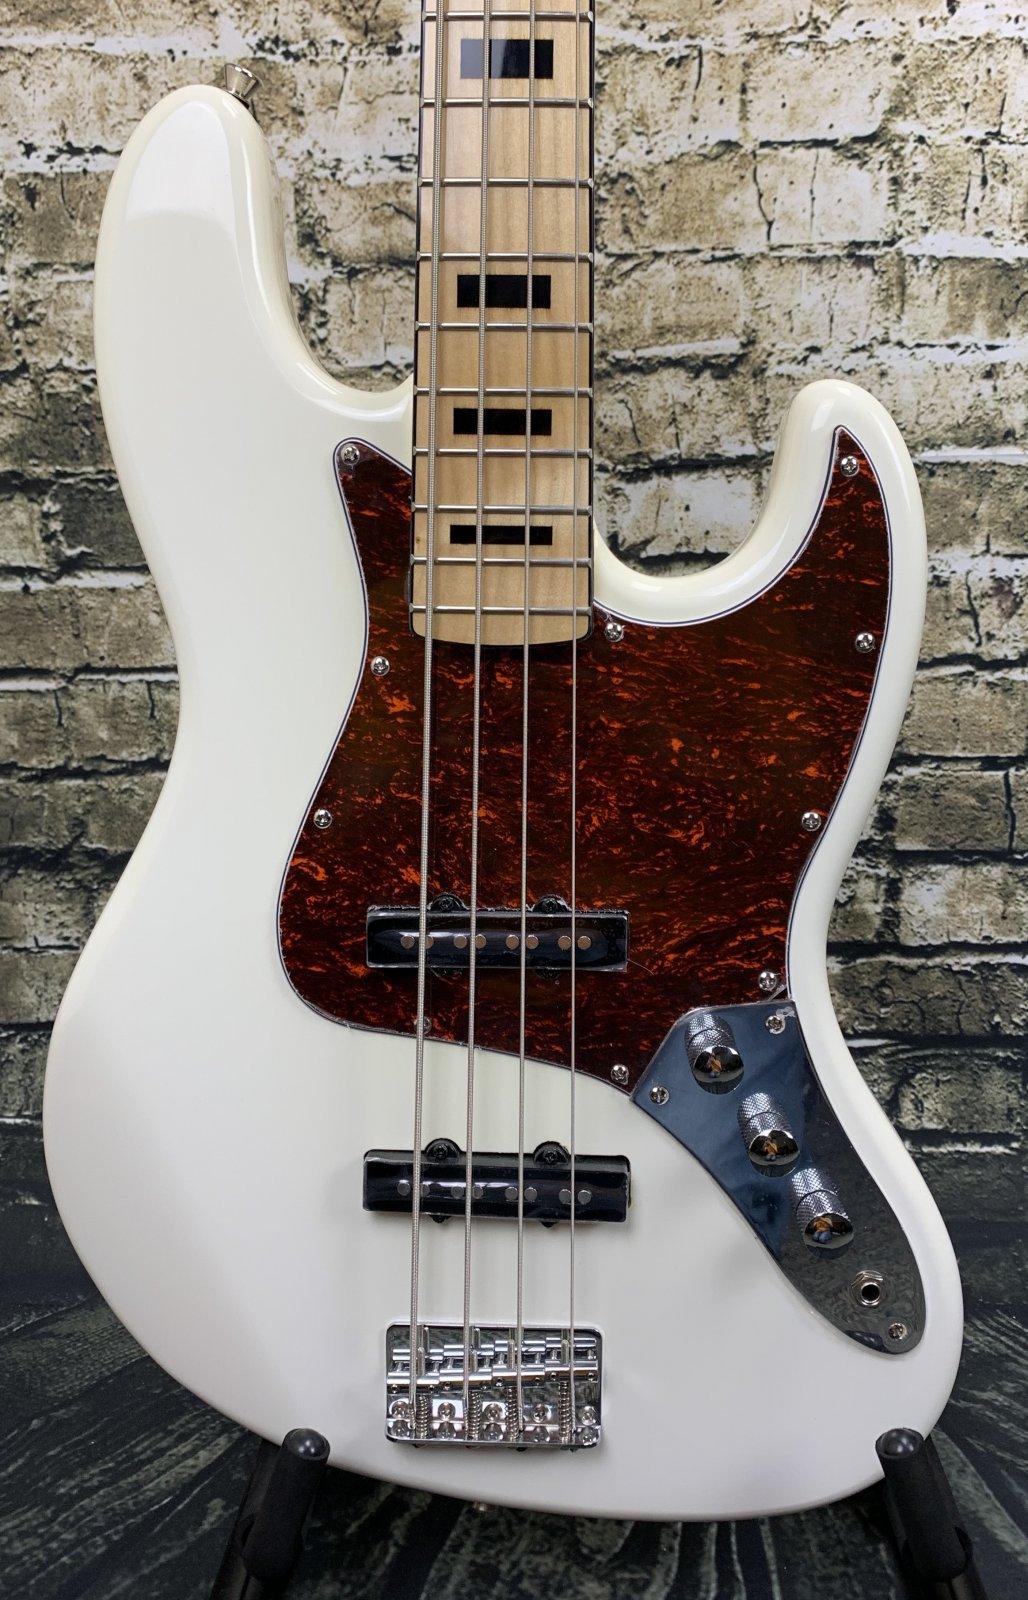 Austin AJB300WH Classic Double Cutaway Bass - White